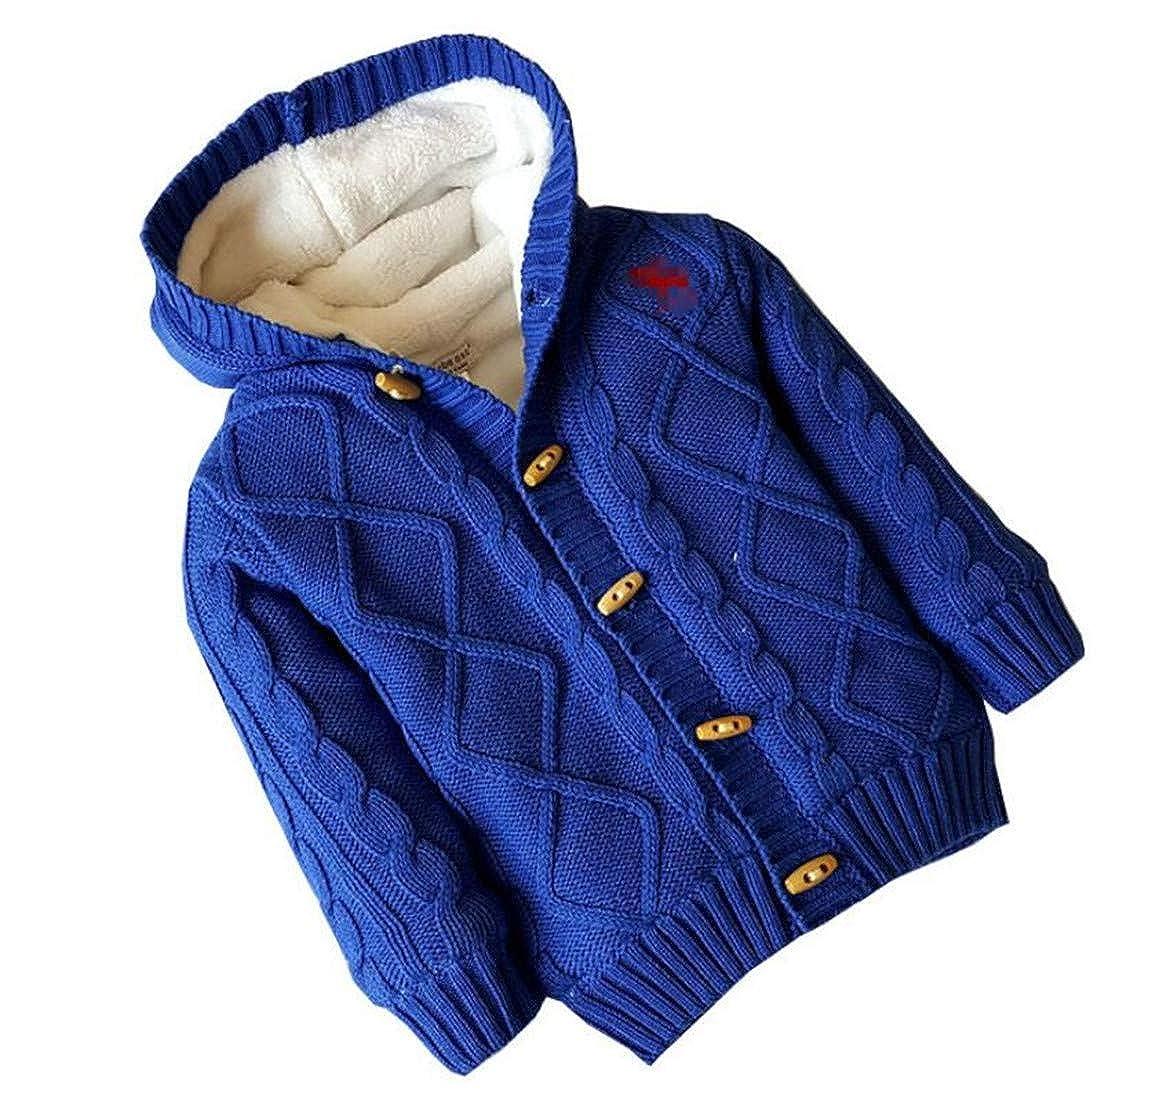 Sweatwater Girls Fleece Boys Hooded Jumper Cotton Coat Cardigans